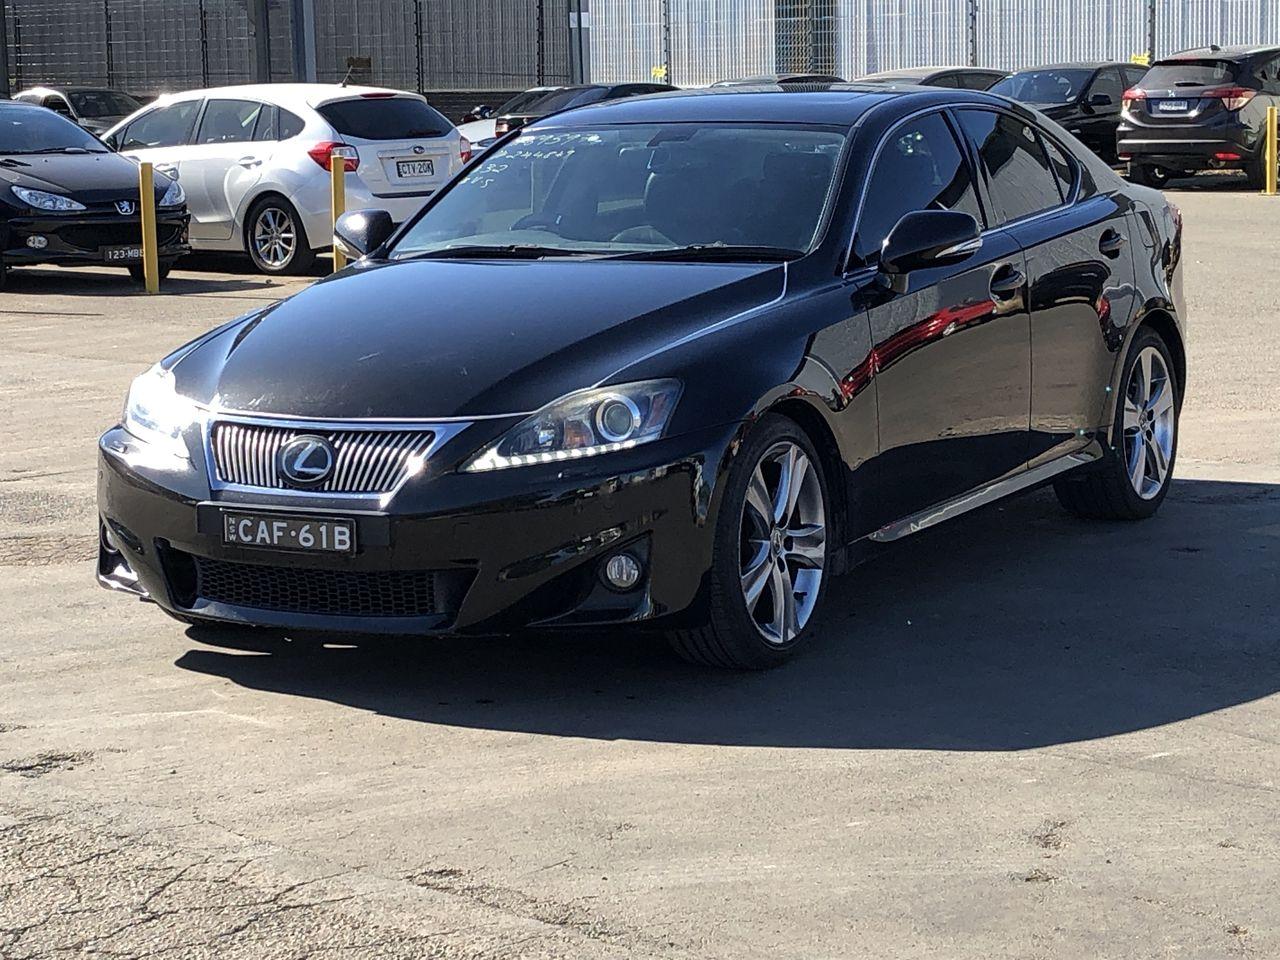 2012 Lexus IS250 Luxury Sports Auto Sedan 119,600kms